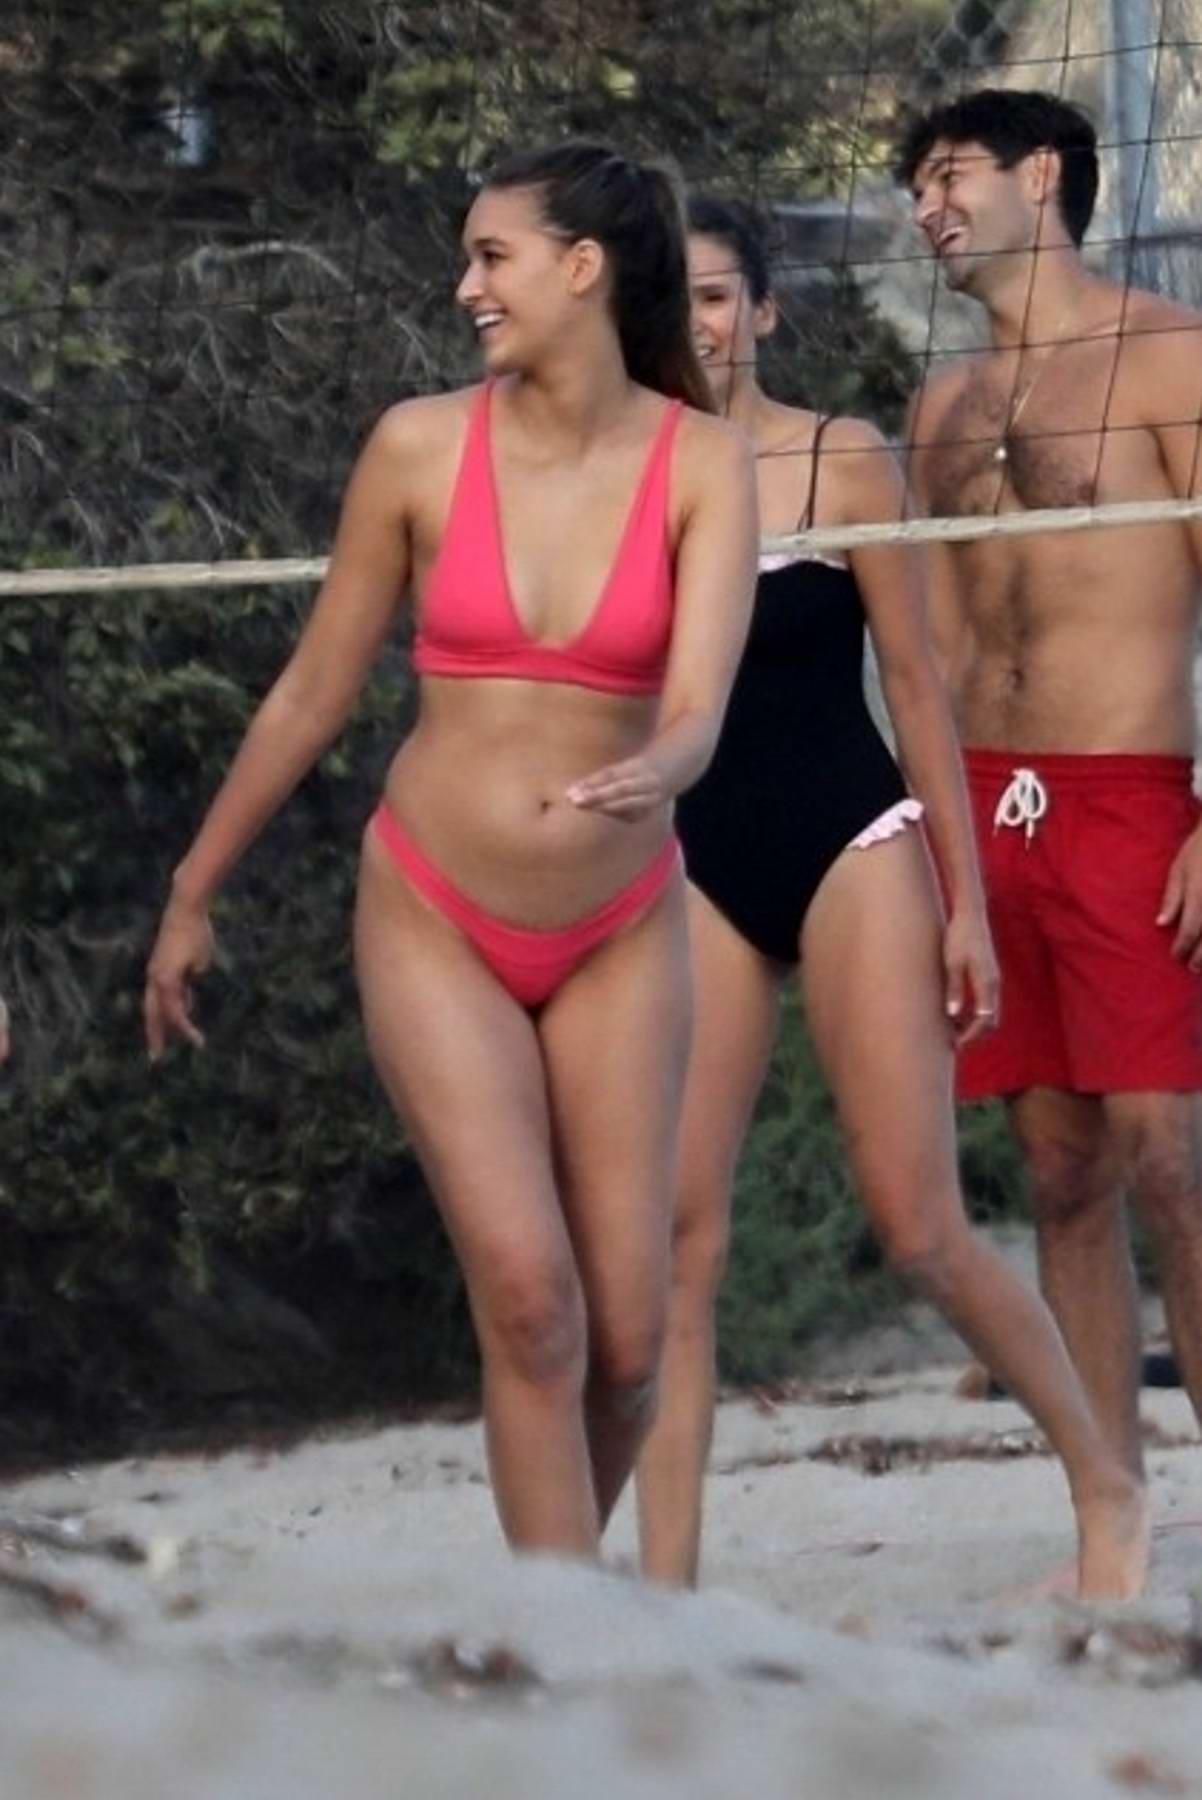 Nina Dobrev Looking Thick In A Bikini - 2019 year